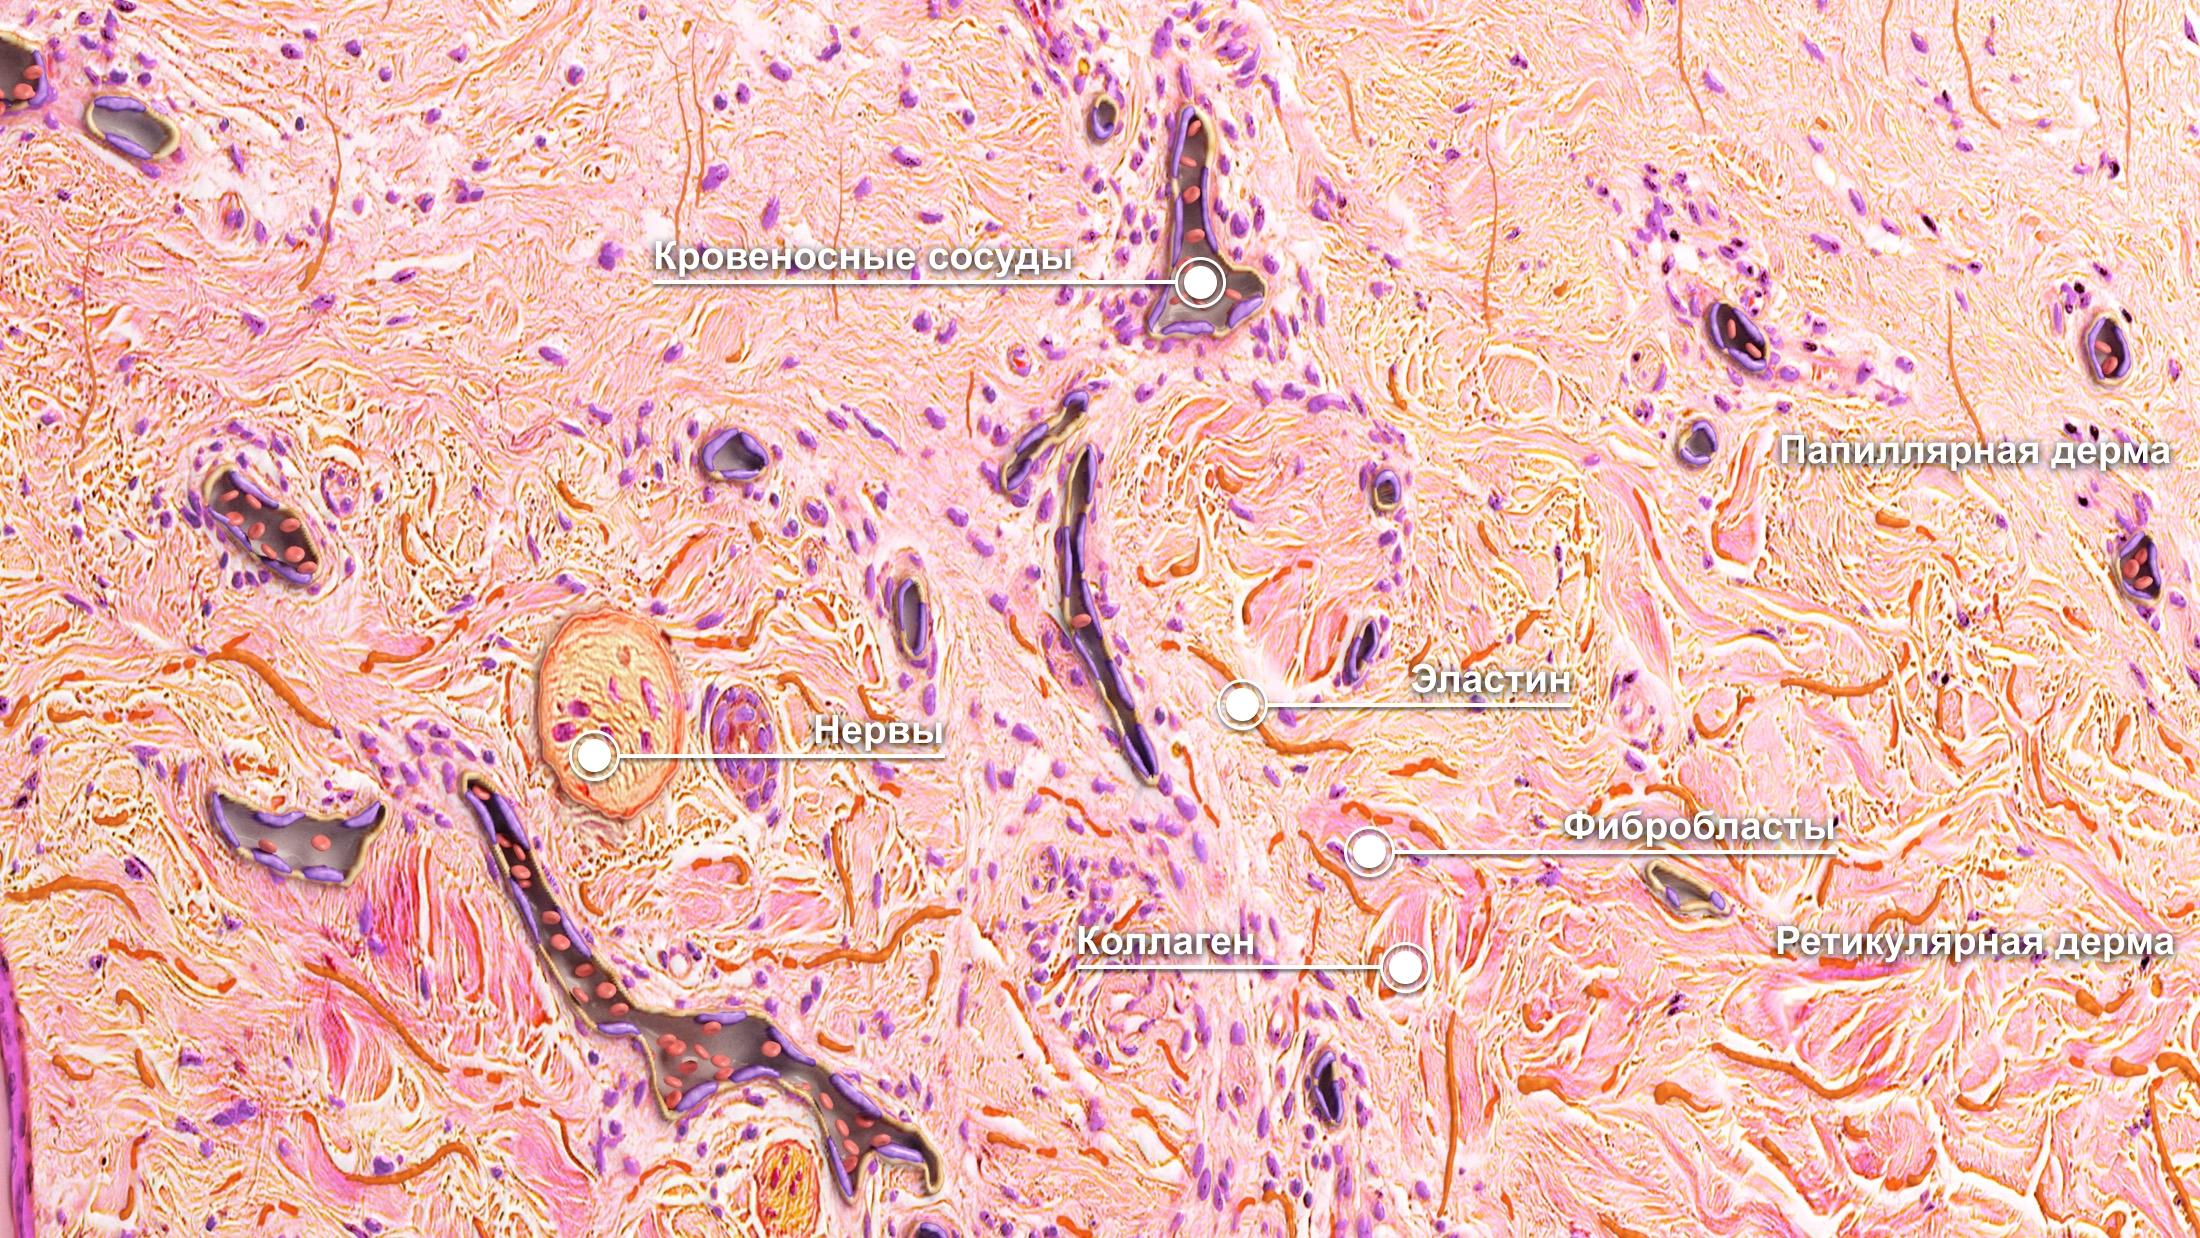 2D virtual skin biopsy dermis